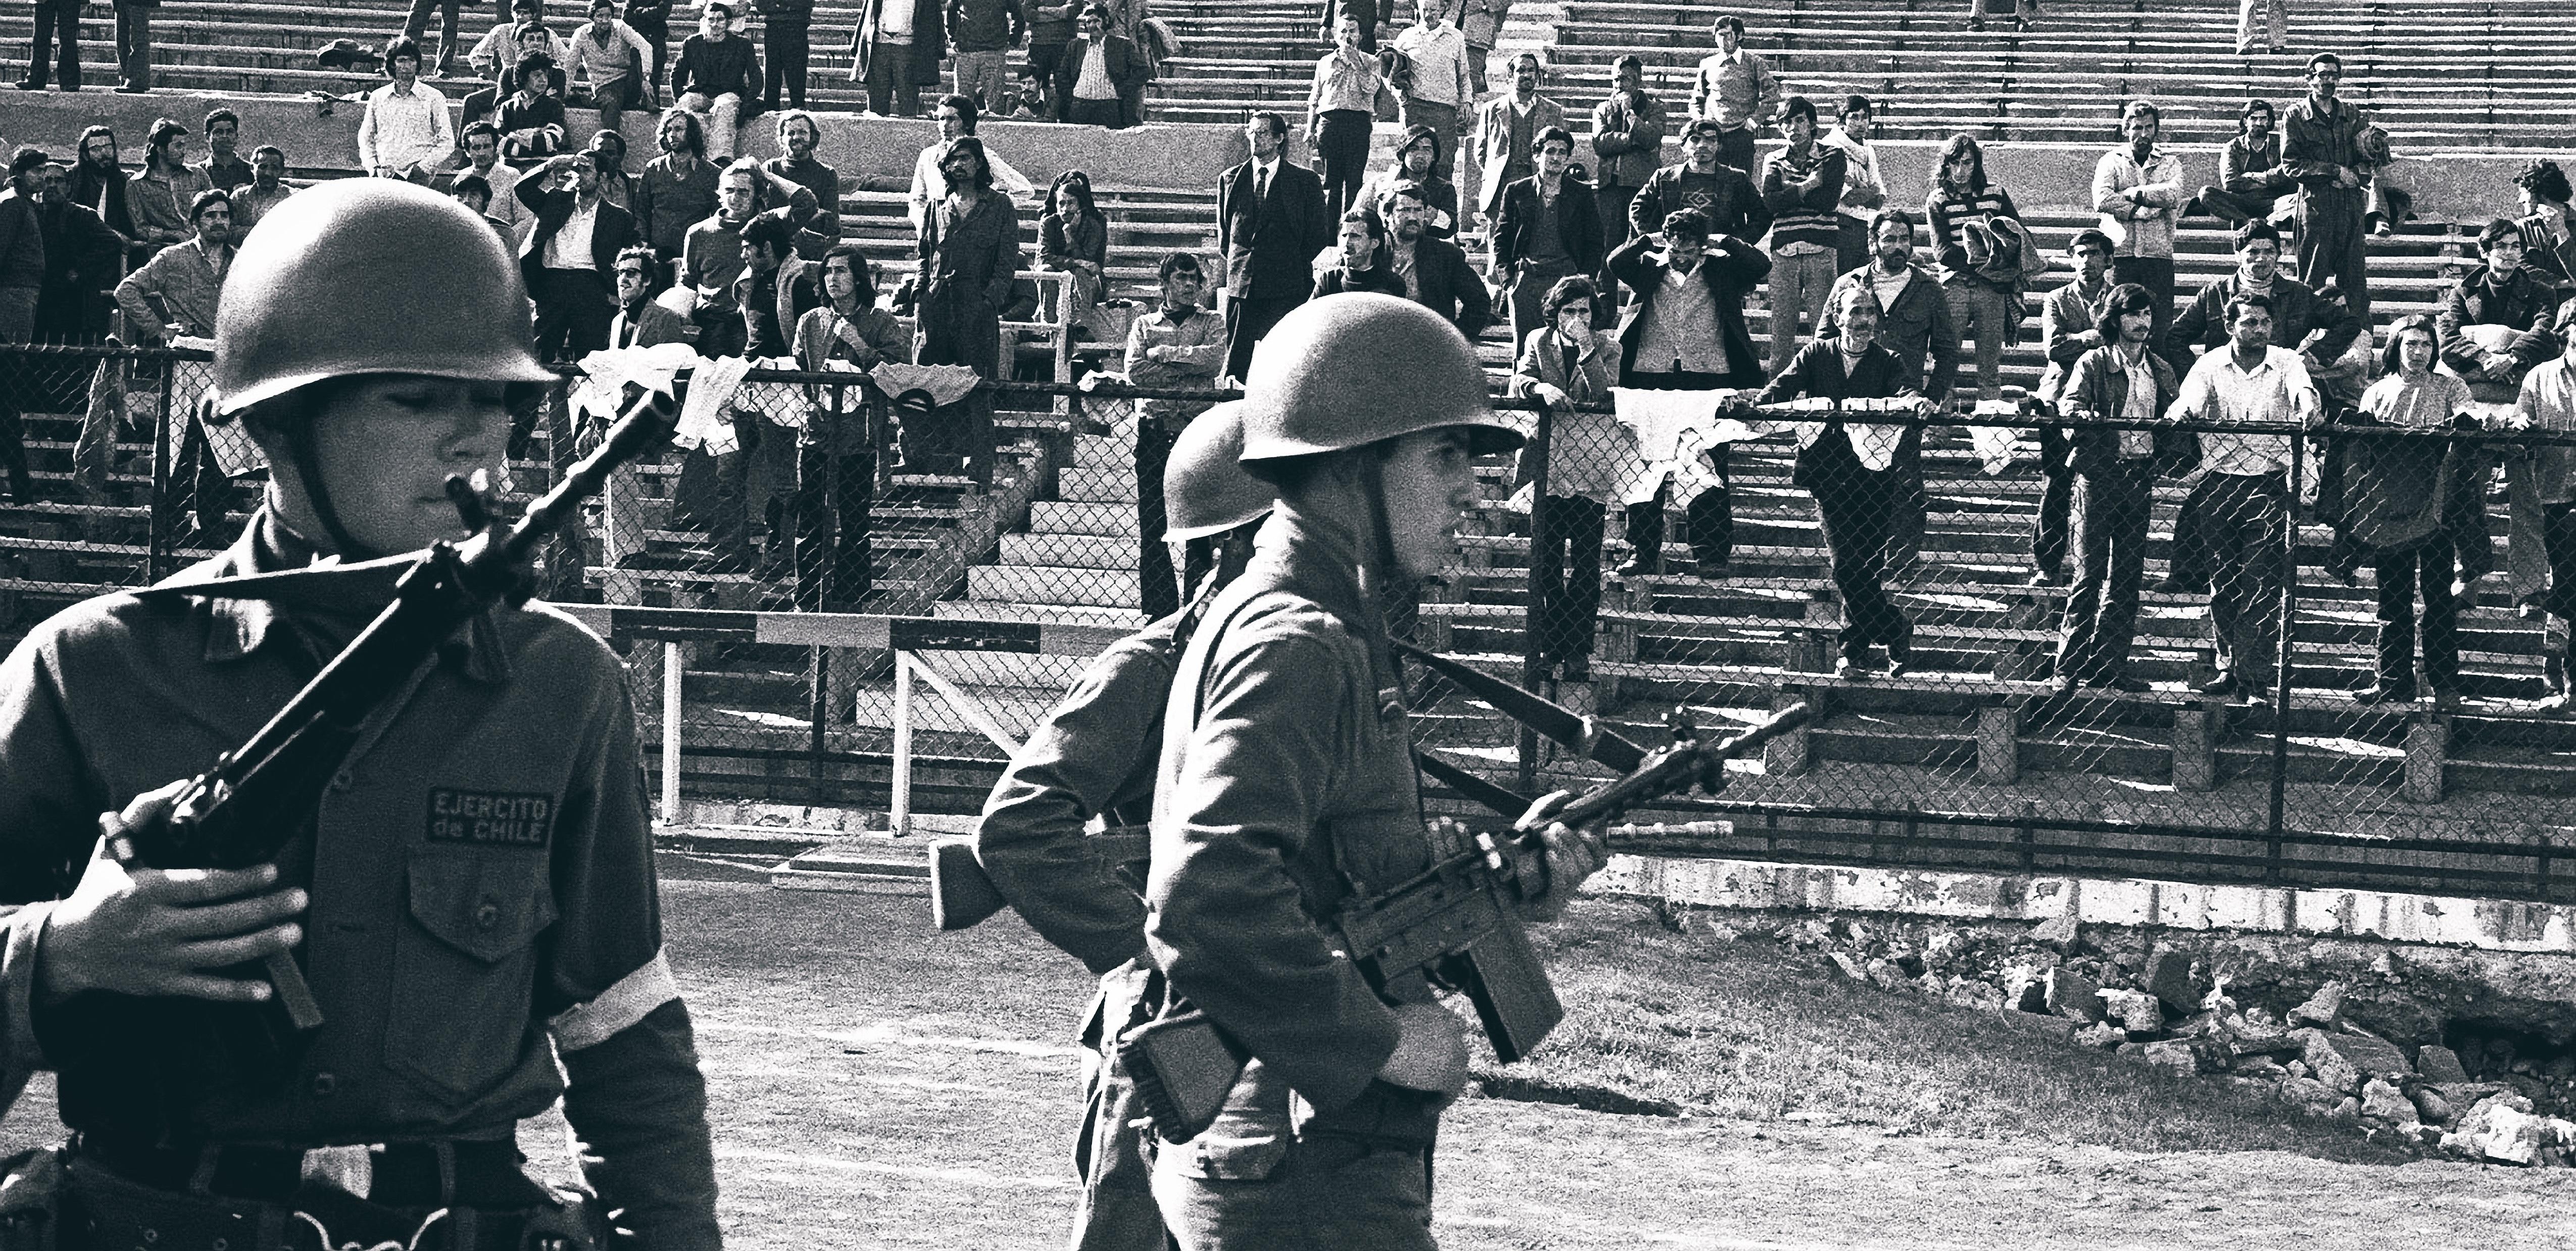 Guards, National Stadium 1973